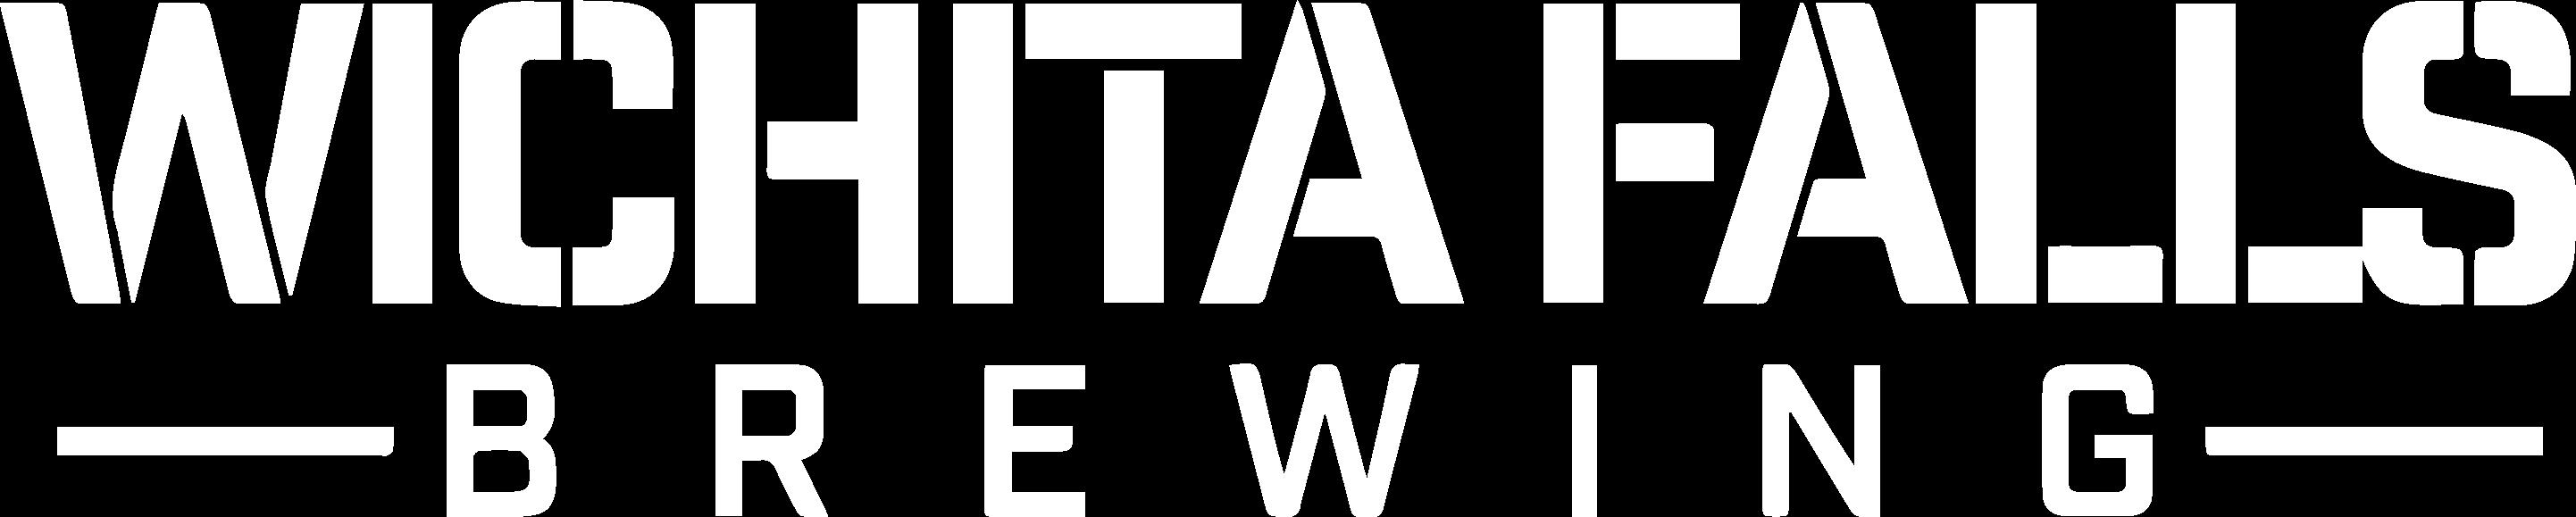 Wichita Falls Brewing Logo